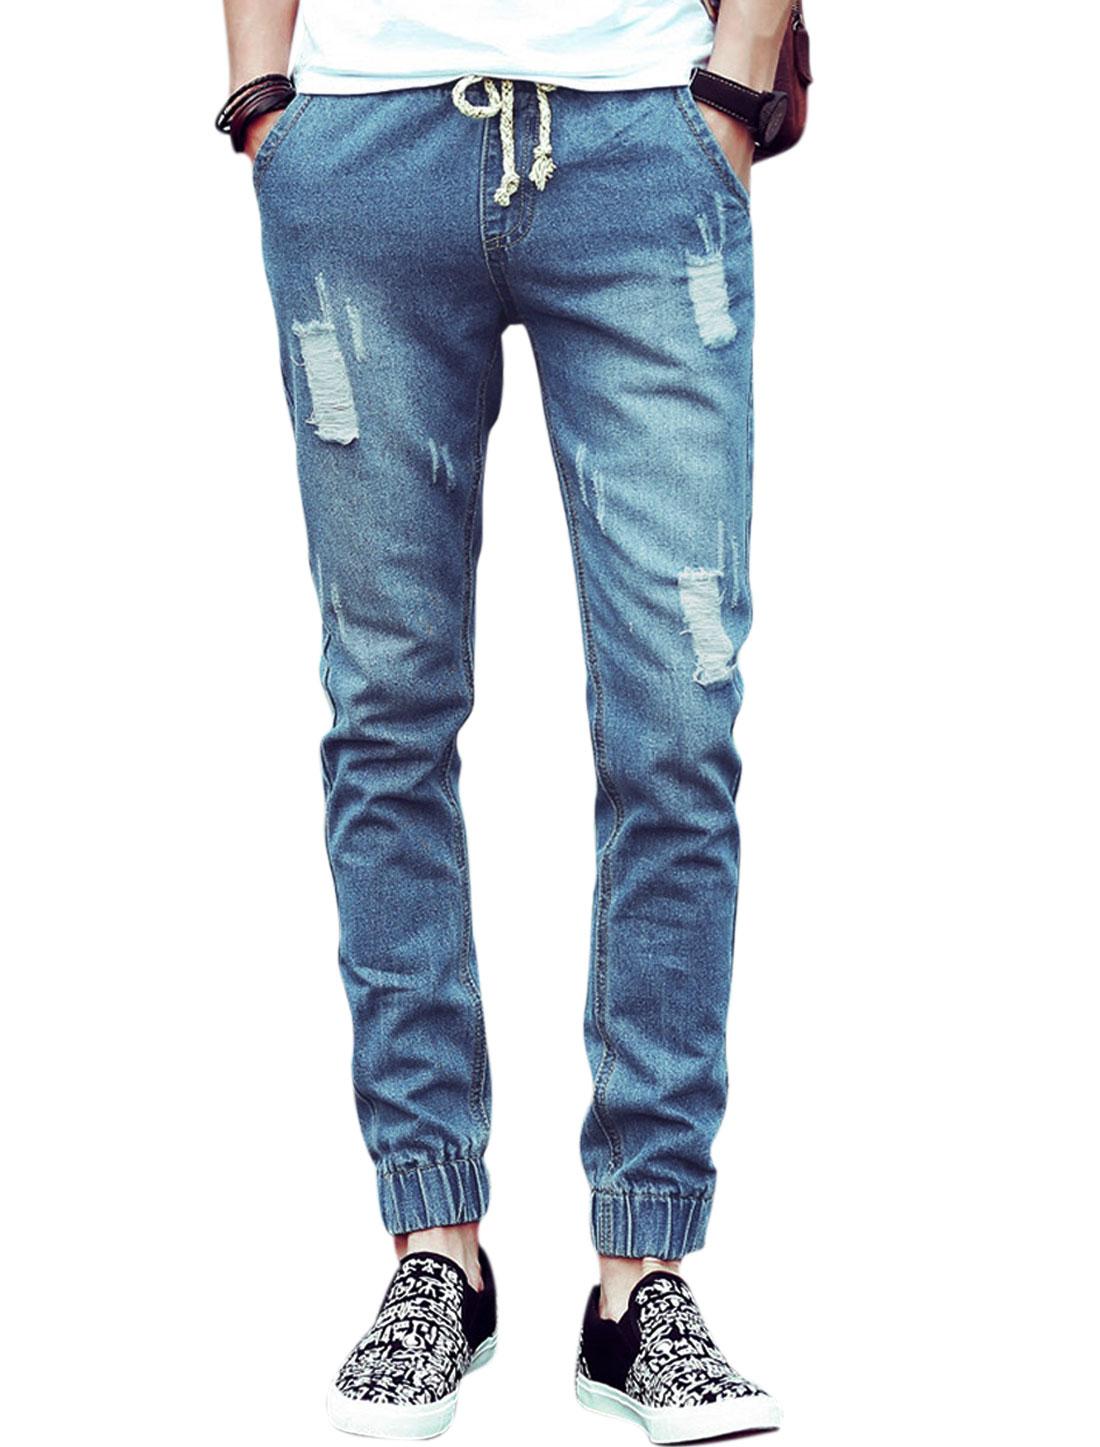 Men Drawstring Waist Hip Pockets Casual Jeans Dark Blue W30